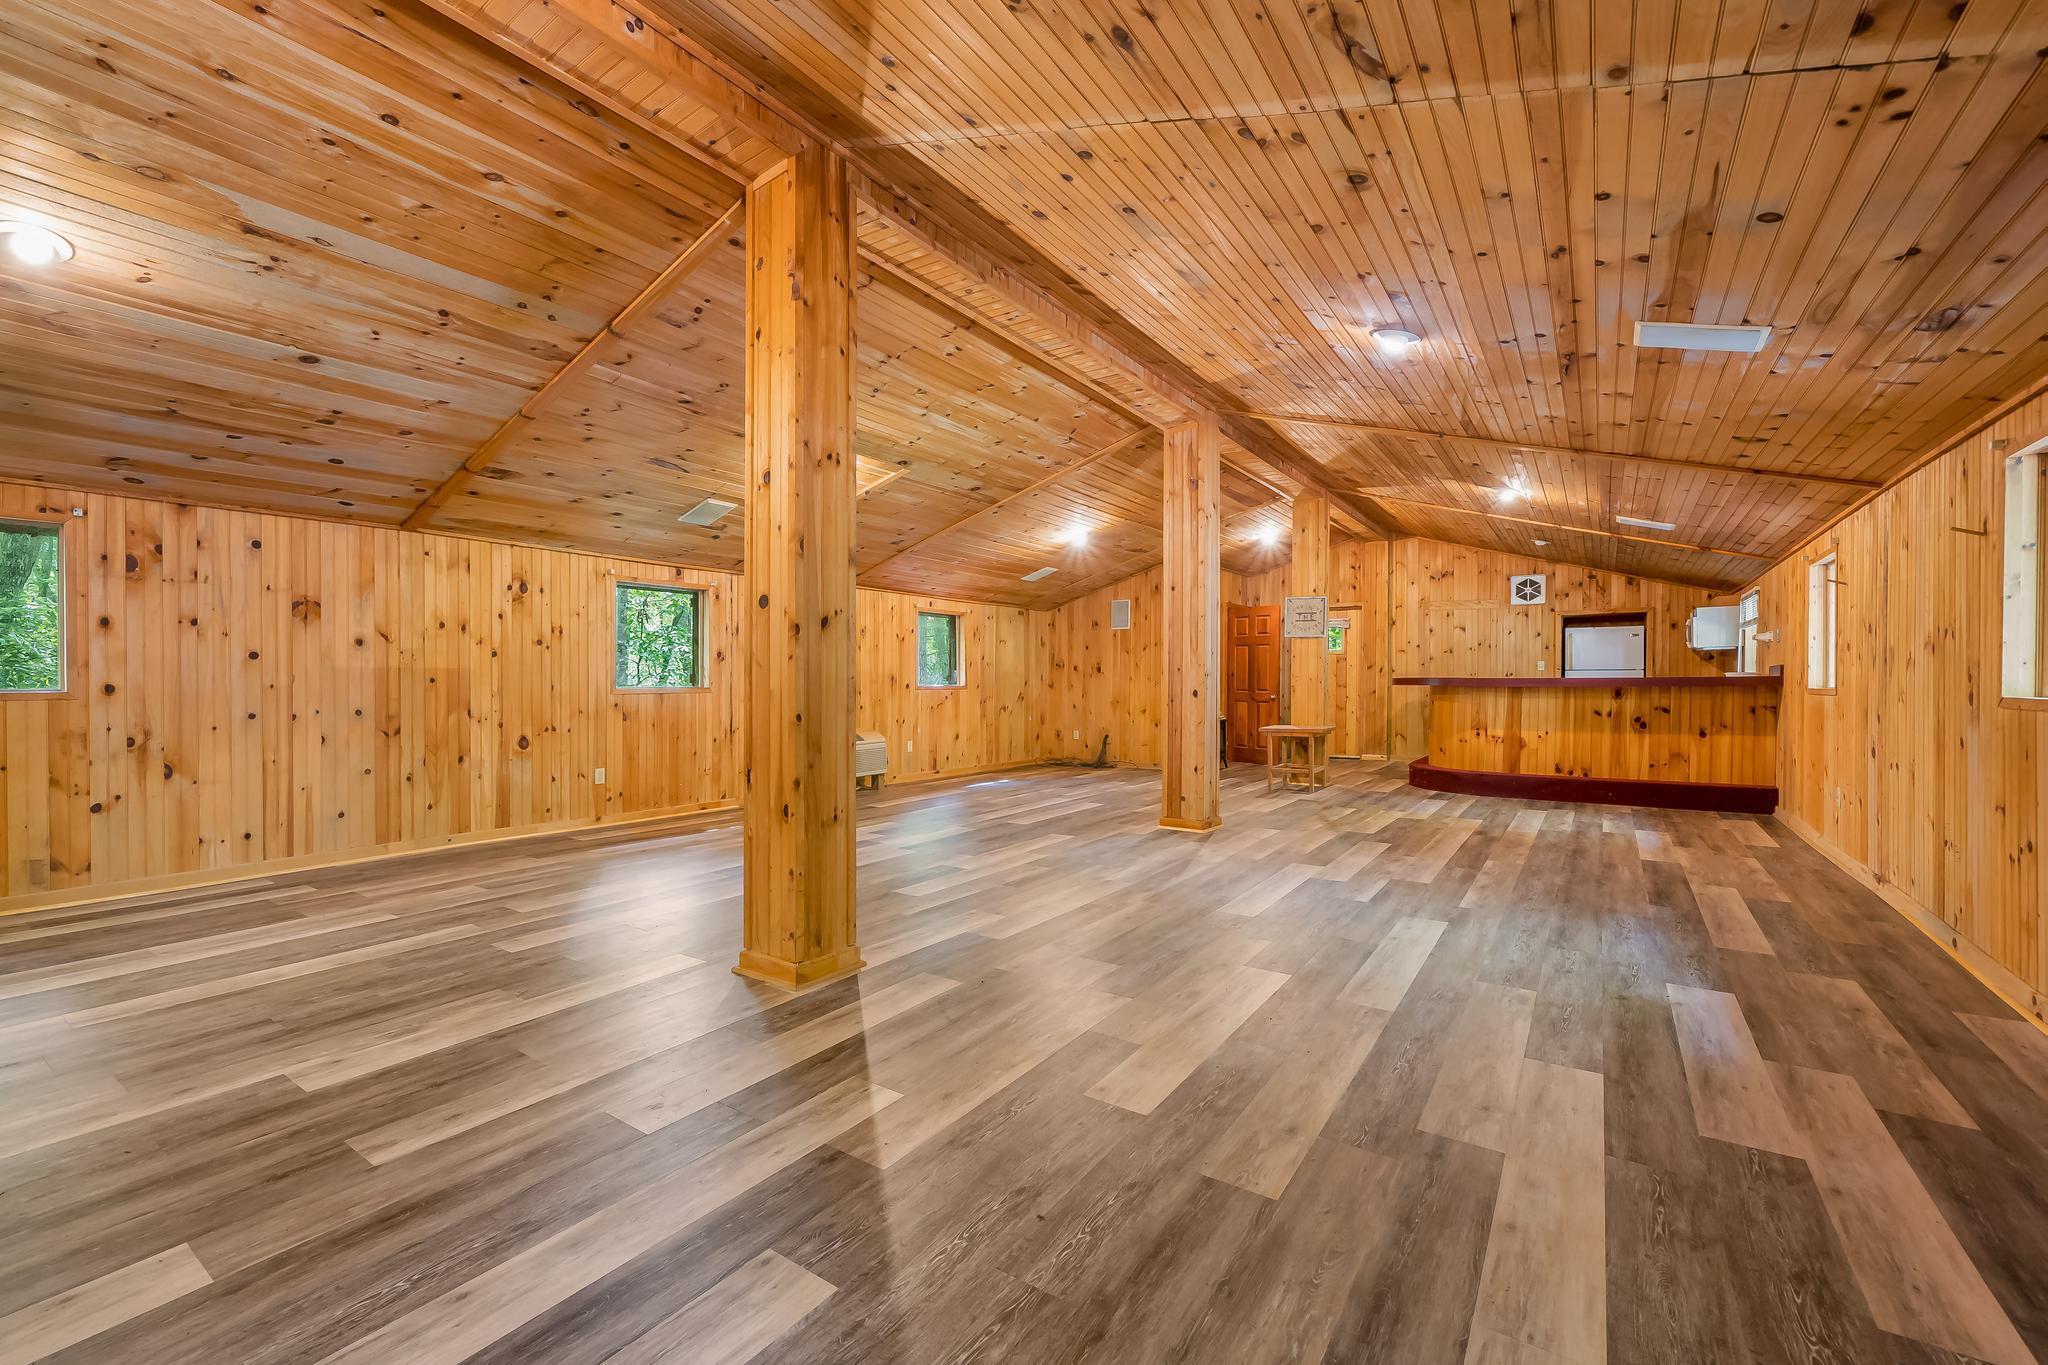 780 Bill Icenhour Lane Lodge (9 of 22)